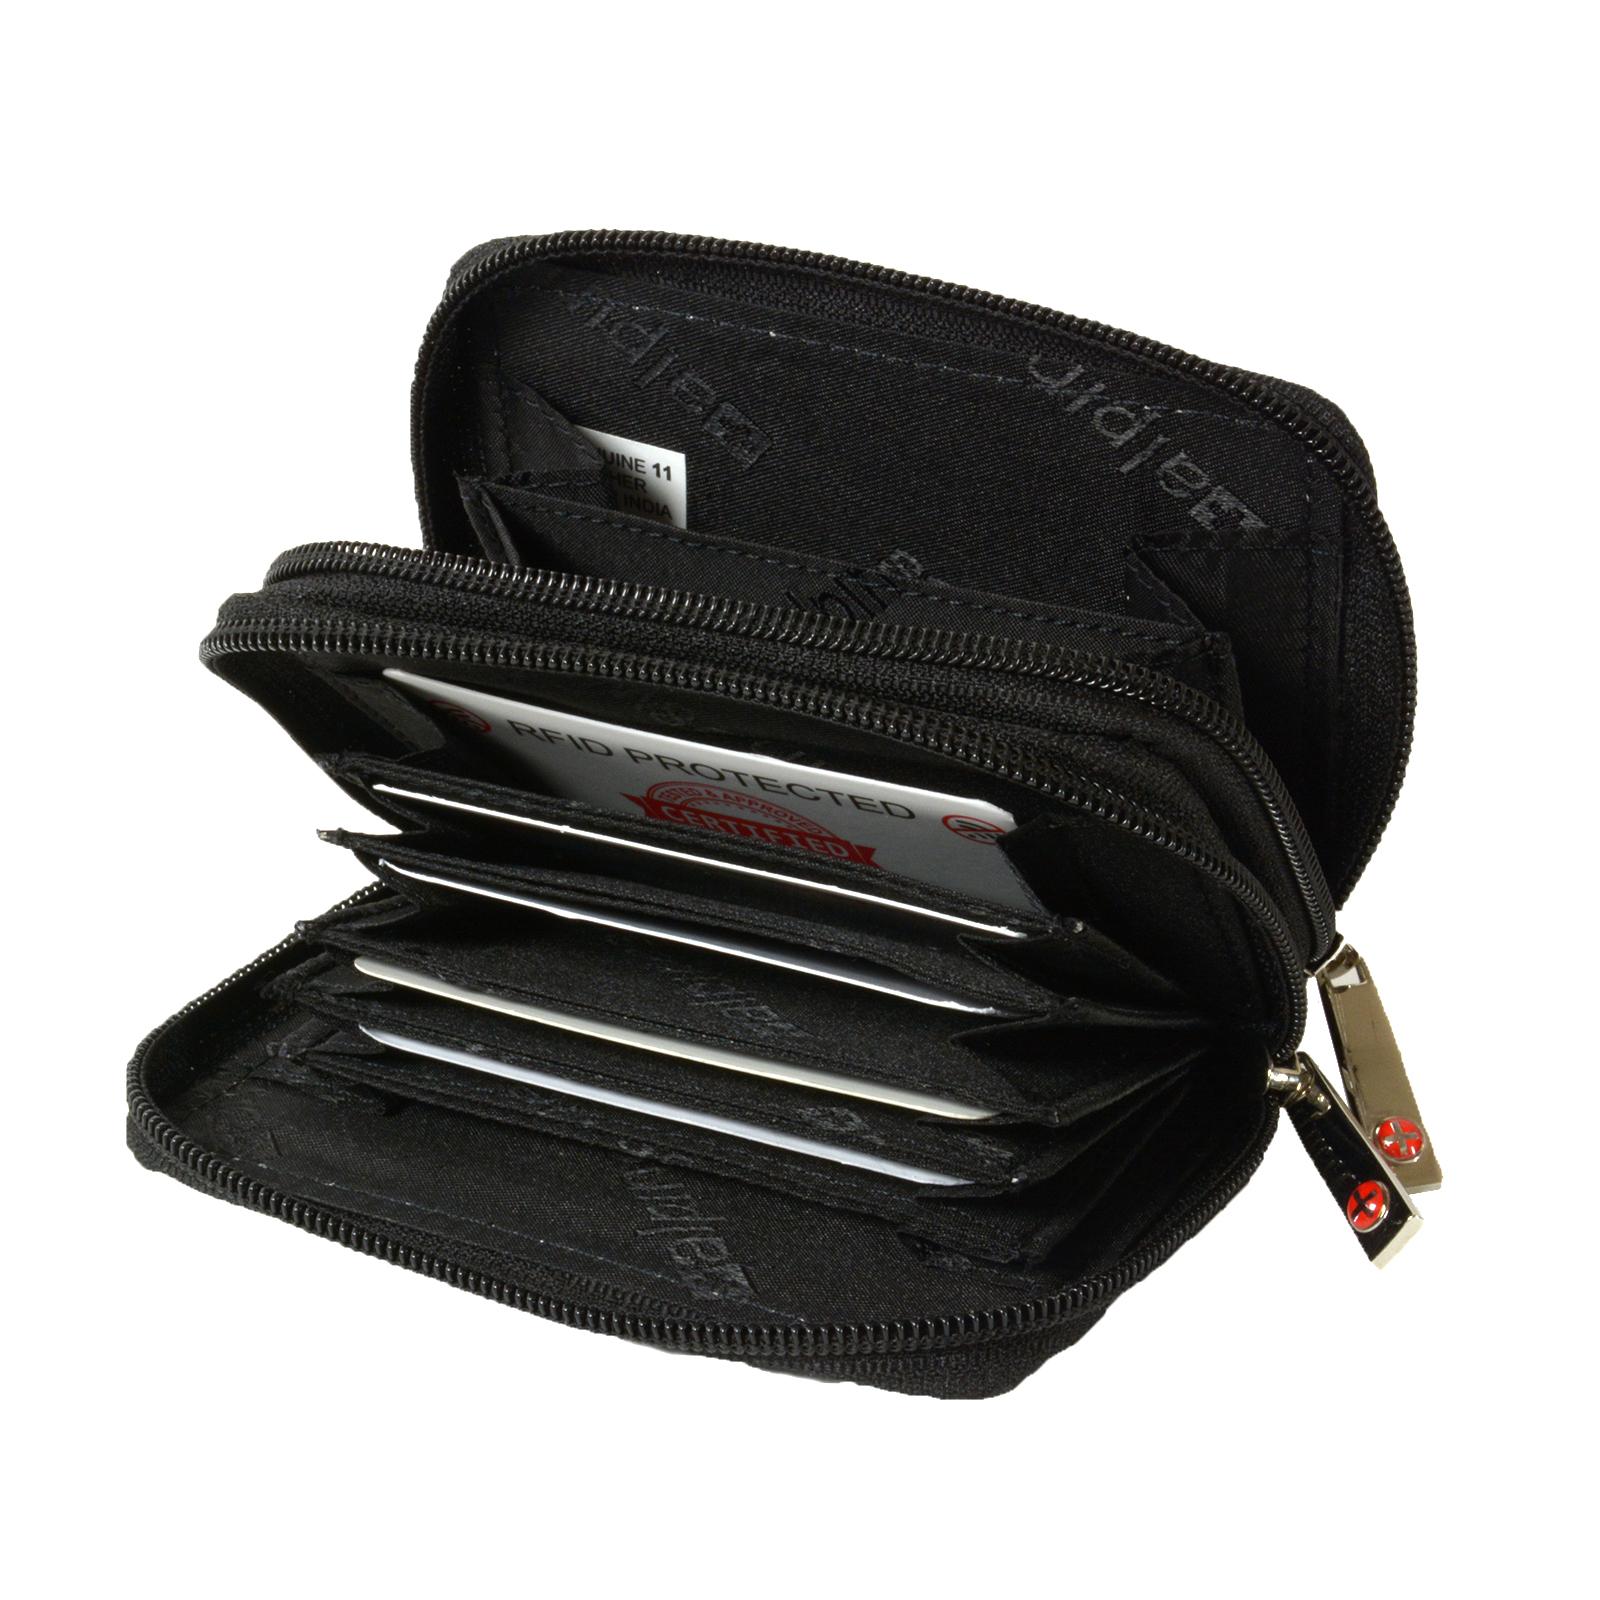 0cda32f88fd Details about Alpine Swiss Womens Accordion Organizer Wallet Leather Credit  Card Case ID